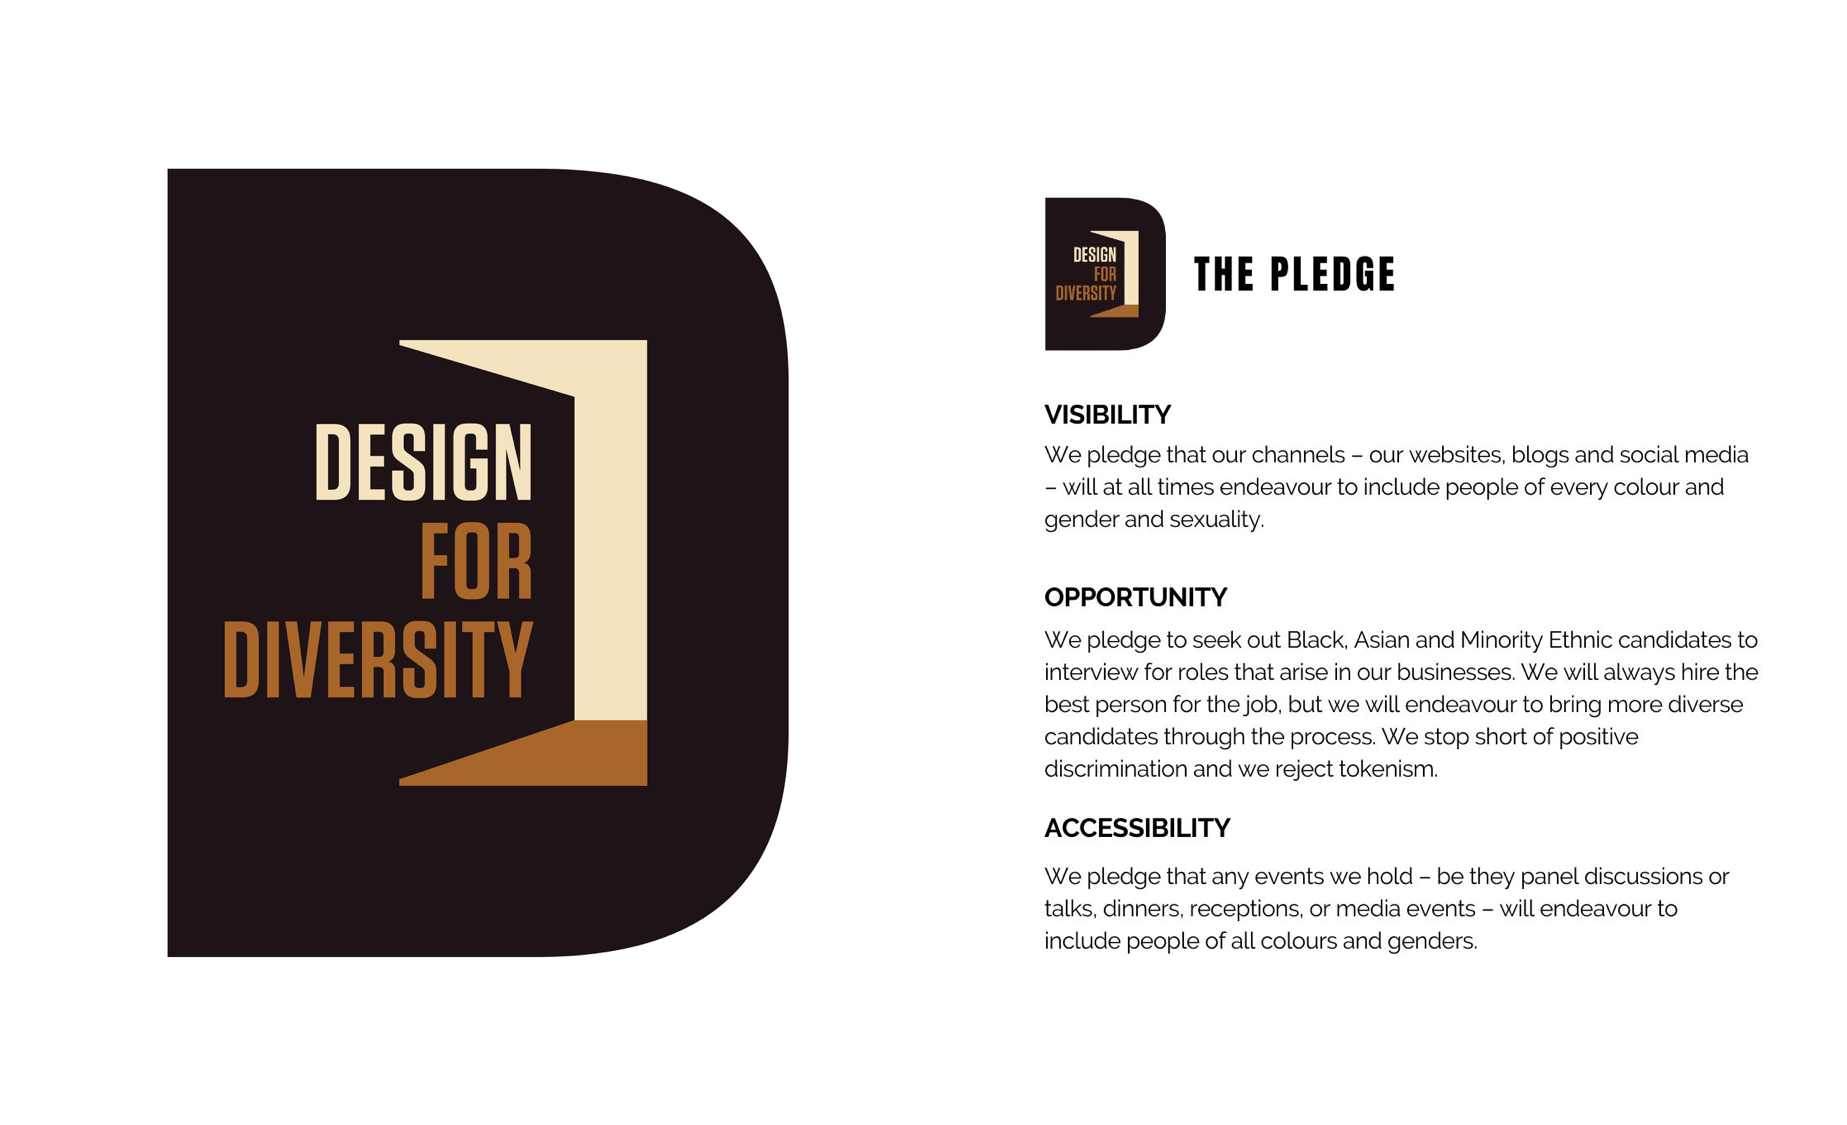 Design For Diversity The Pledge